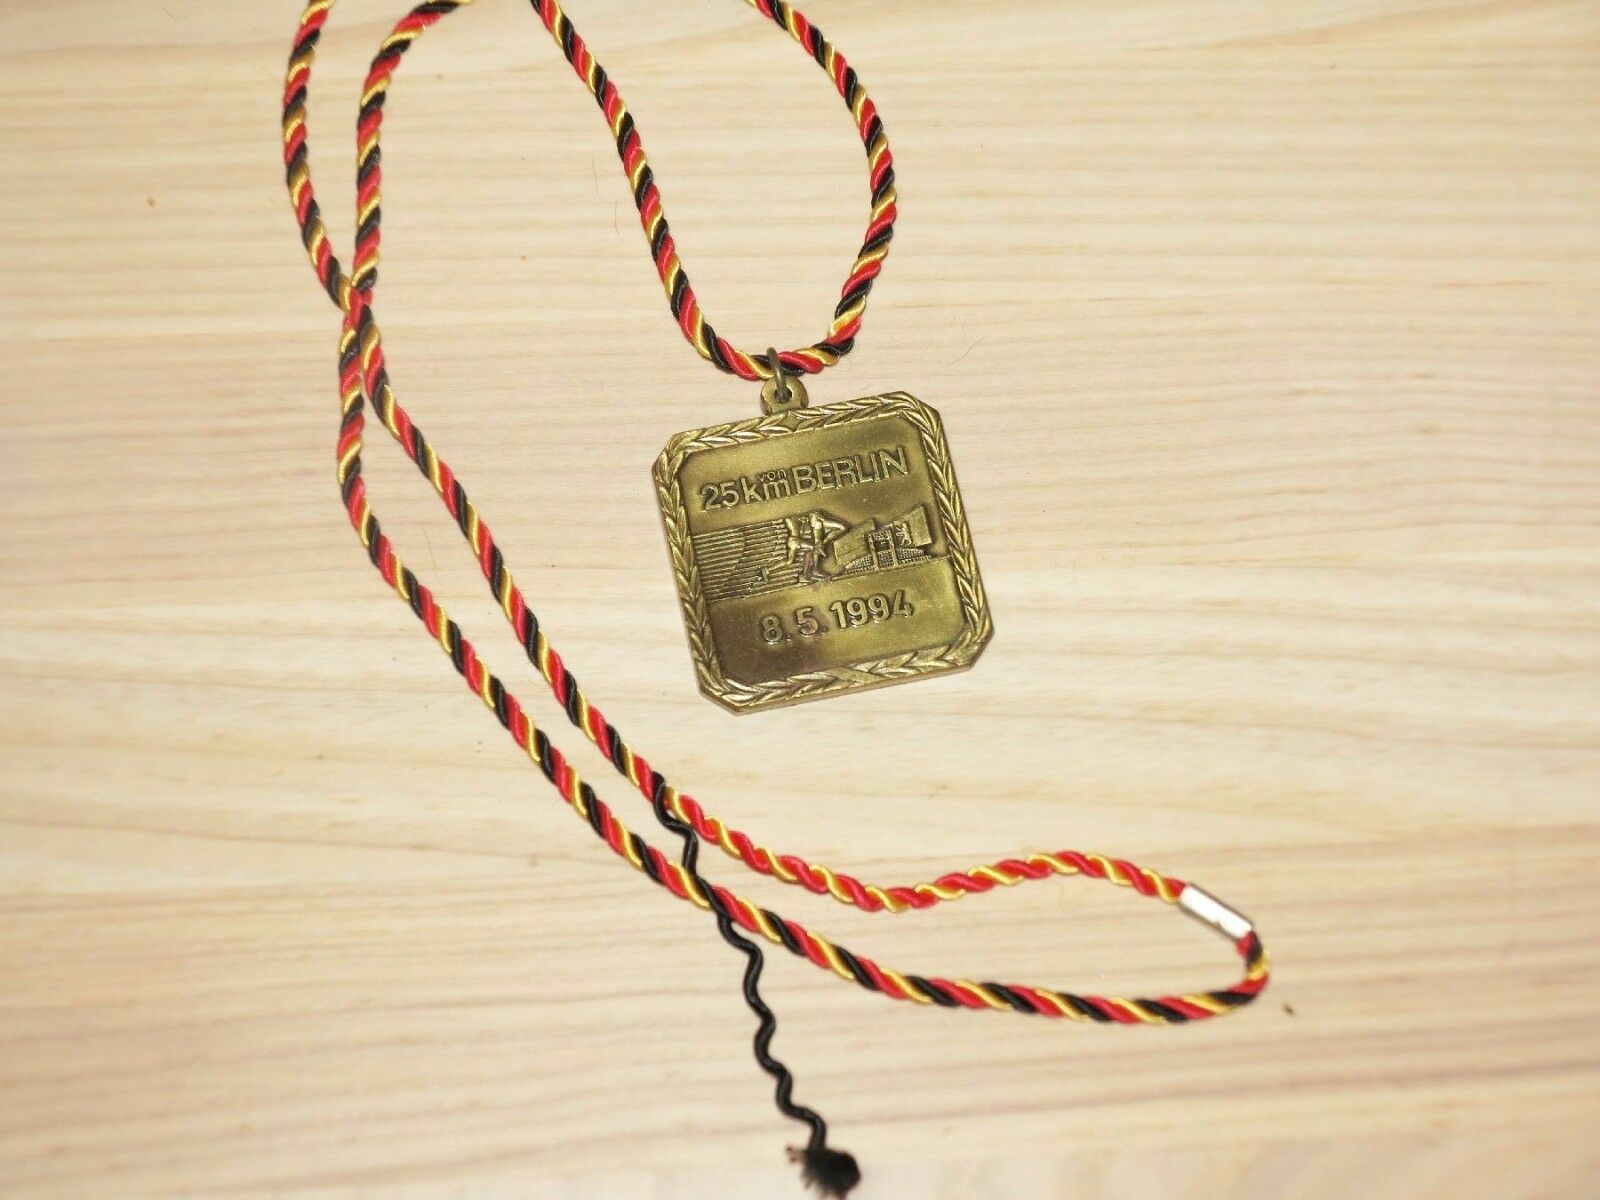 25 KM of Berlin Marathon 1994 Medaille Original Subscriber Finisher - Top RAR